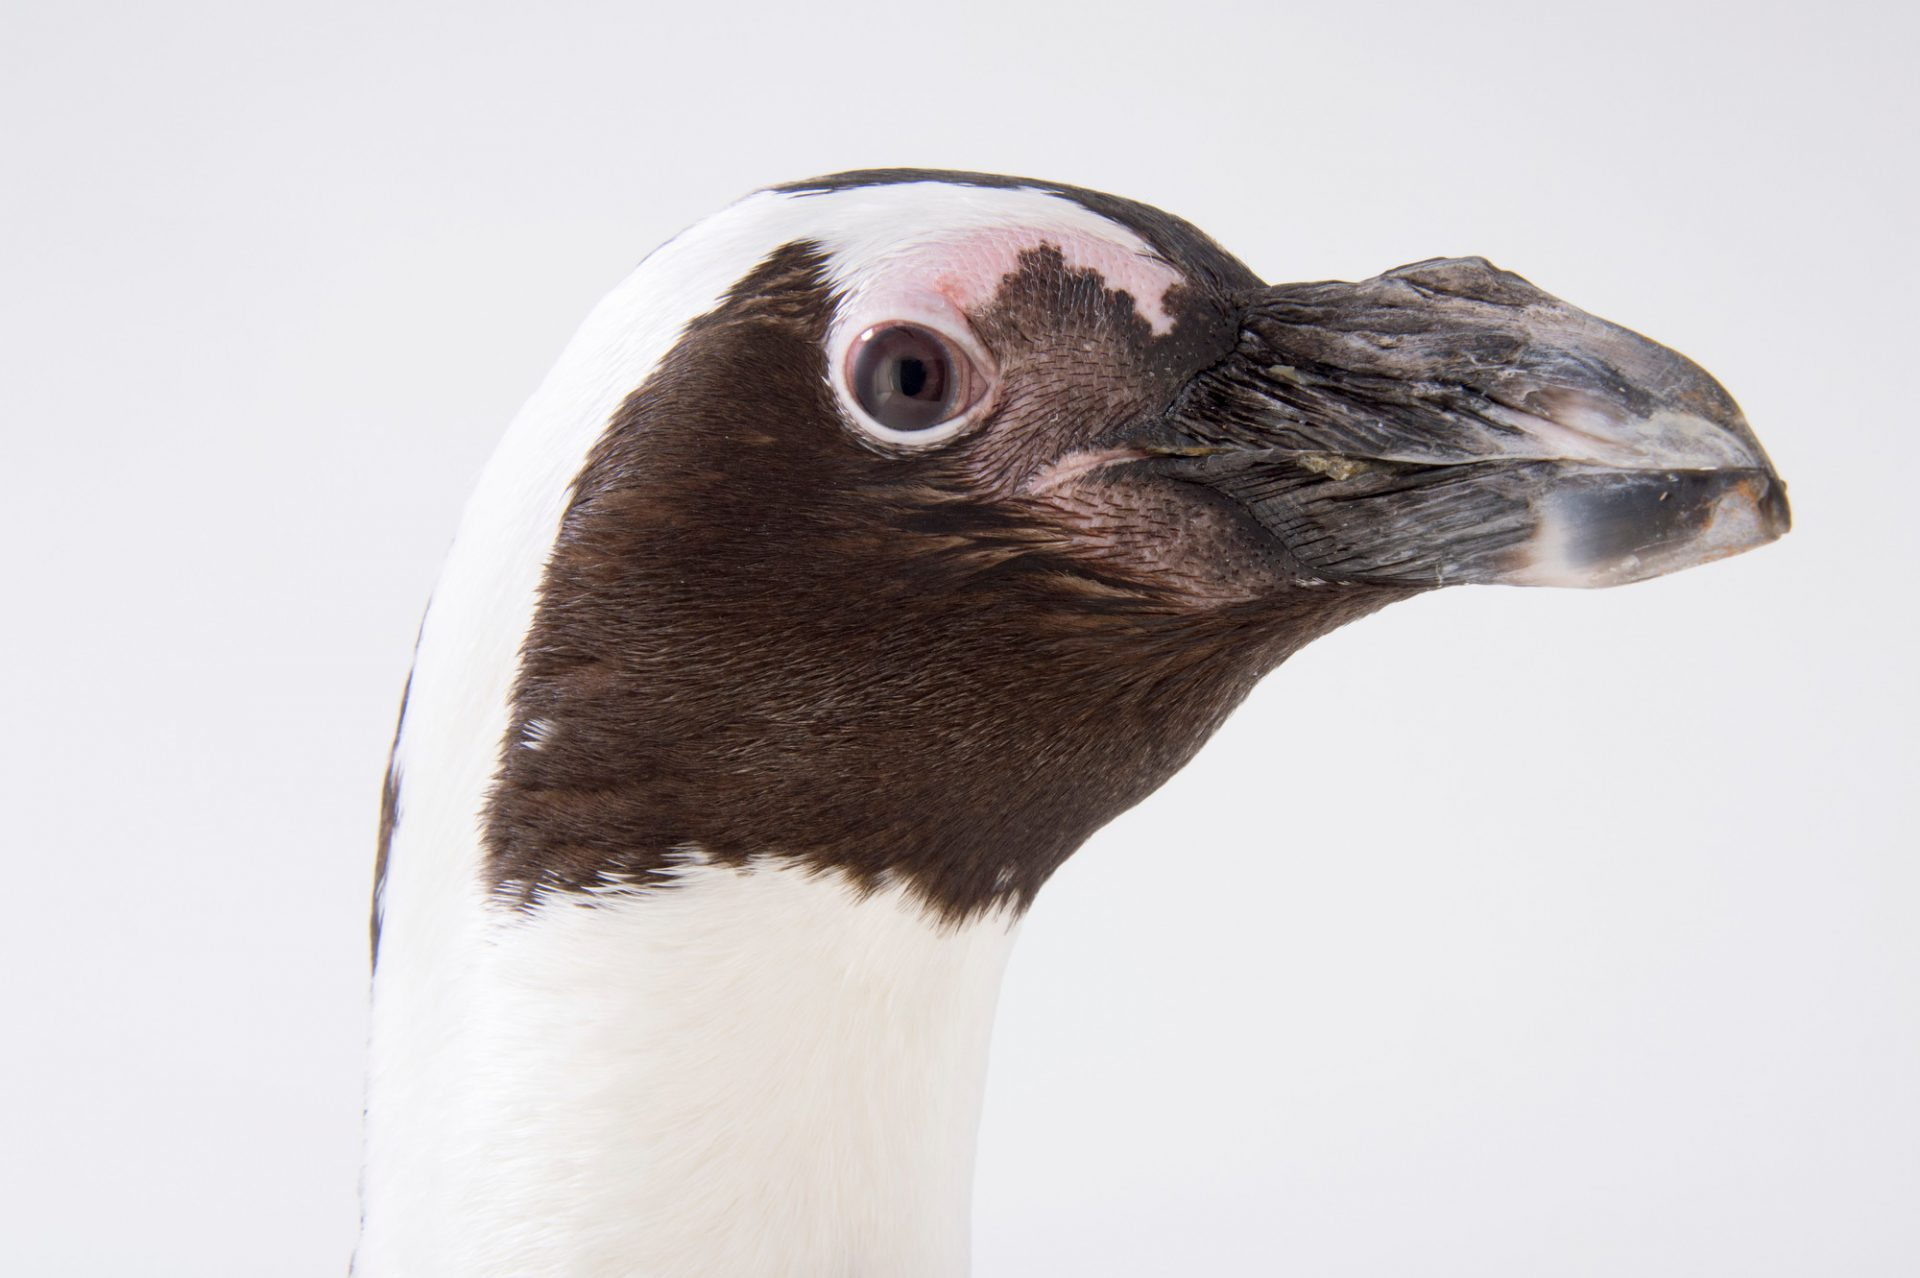 Picture of an endangered African penguin (Spheniscus demersus) at the Monterey Bay Aquarium.